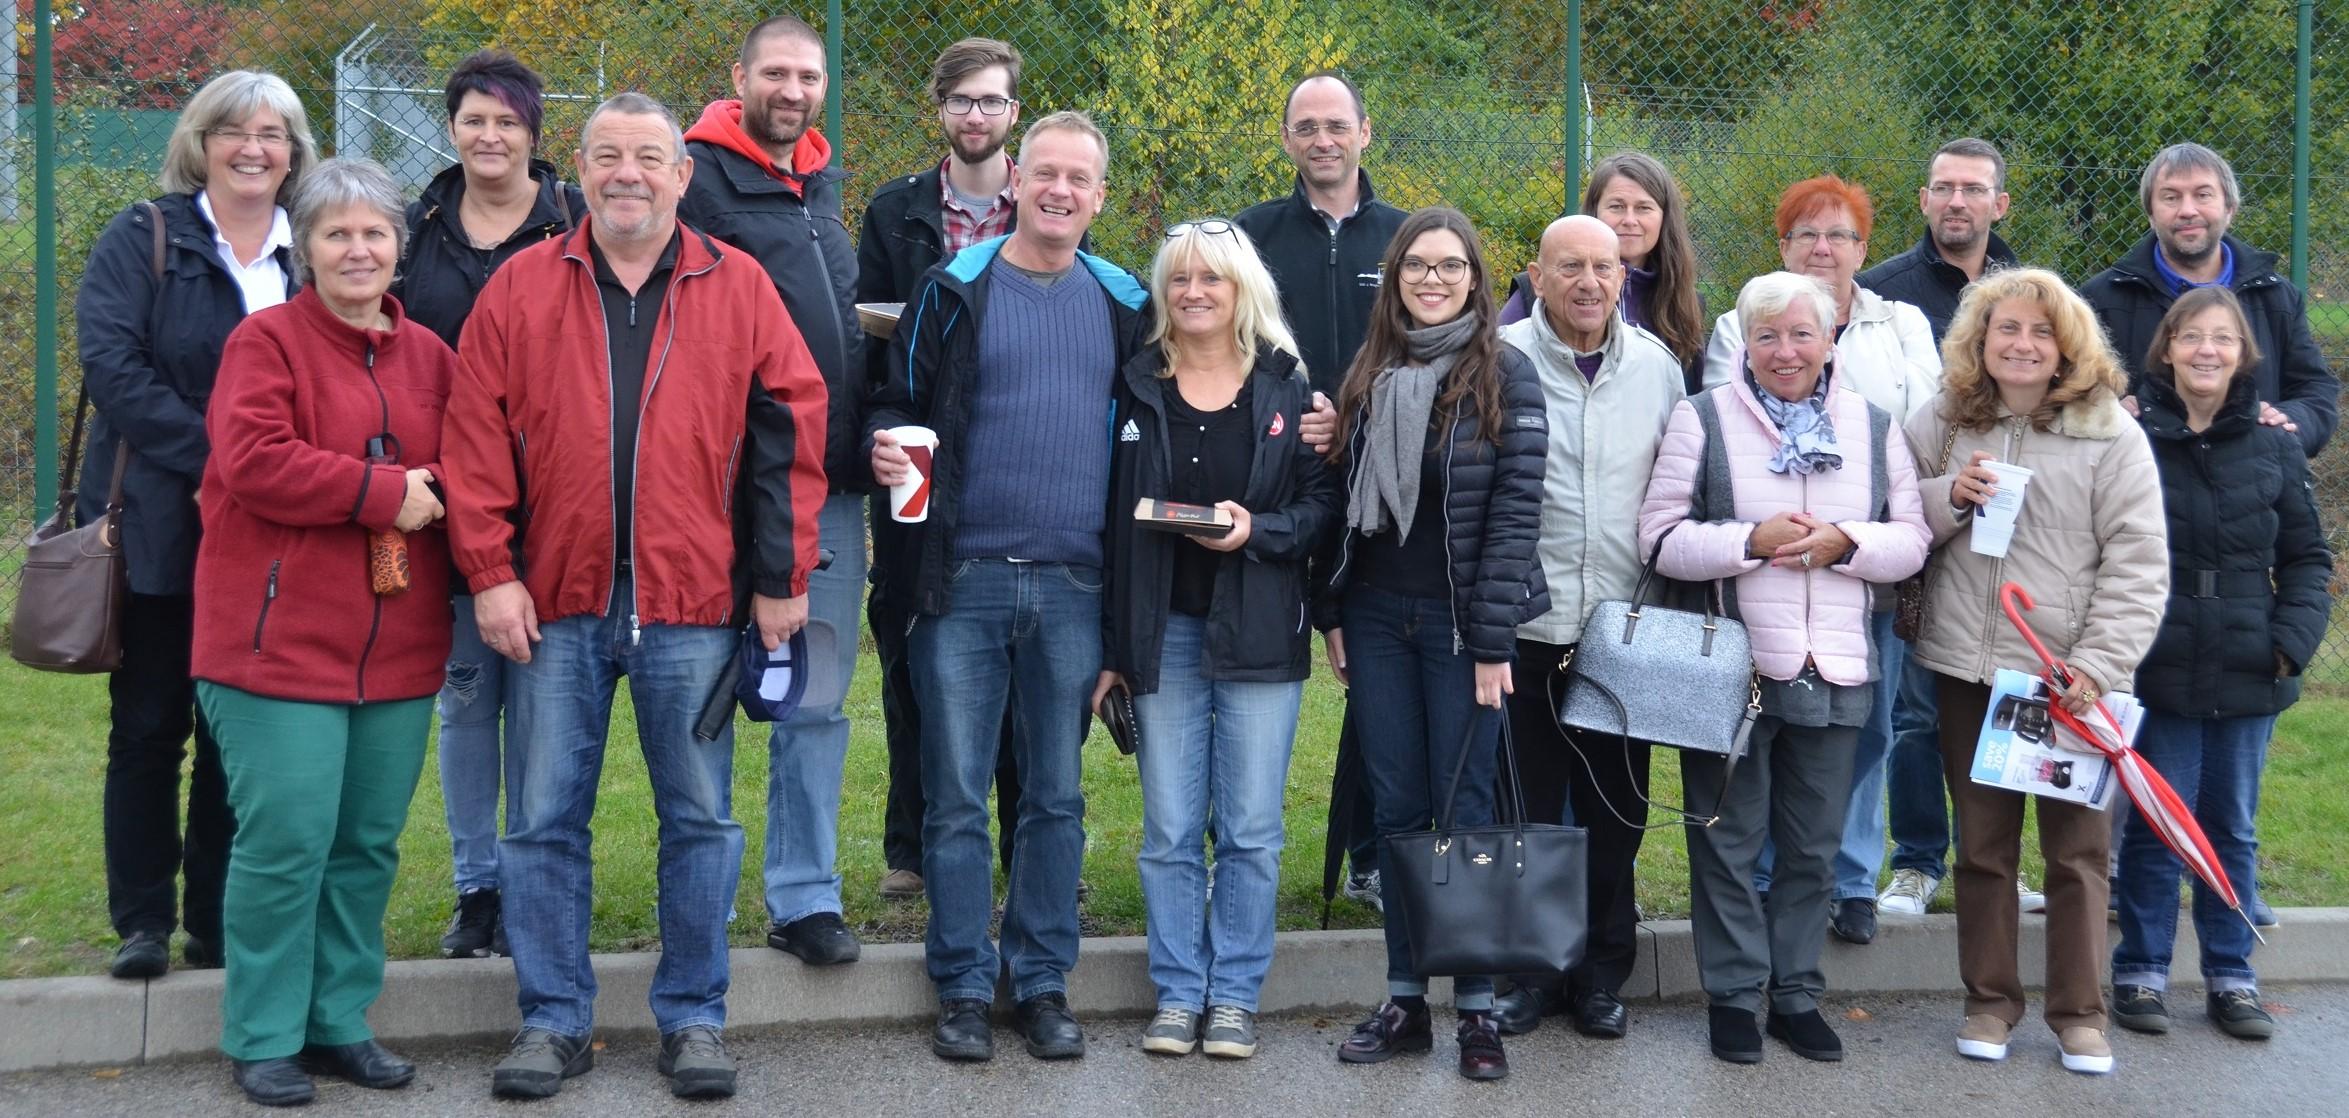 Members of Outreach-KONTAKT Franken, U.S. Army Garrison Ansbach's official German-American friendship club, toured Katterbach Kaserne, Bismarck Kaserne and Urlas Community Oct. 21.